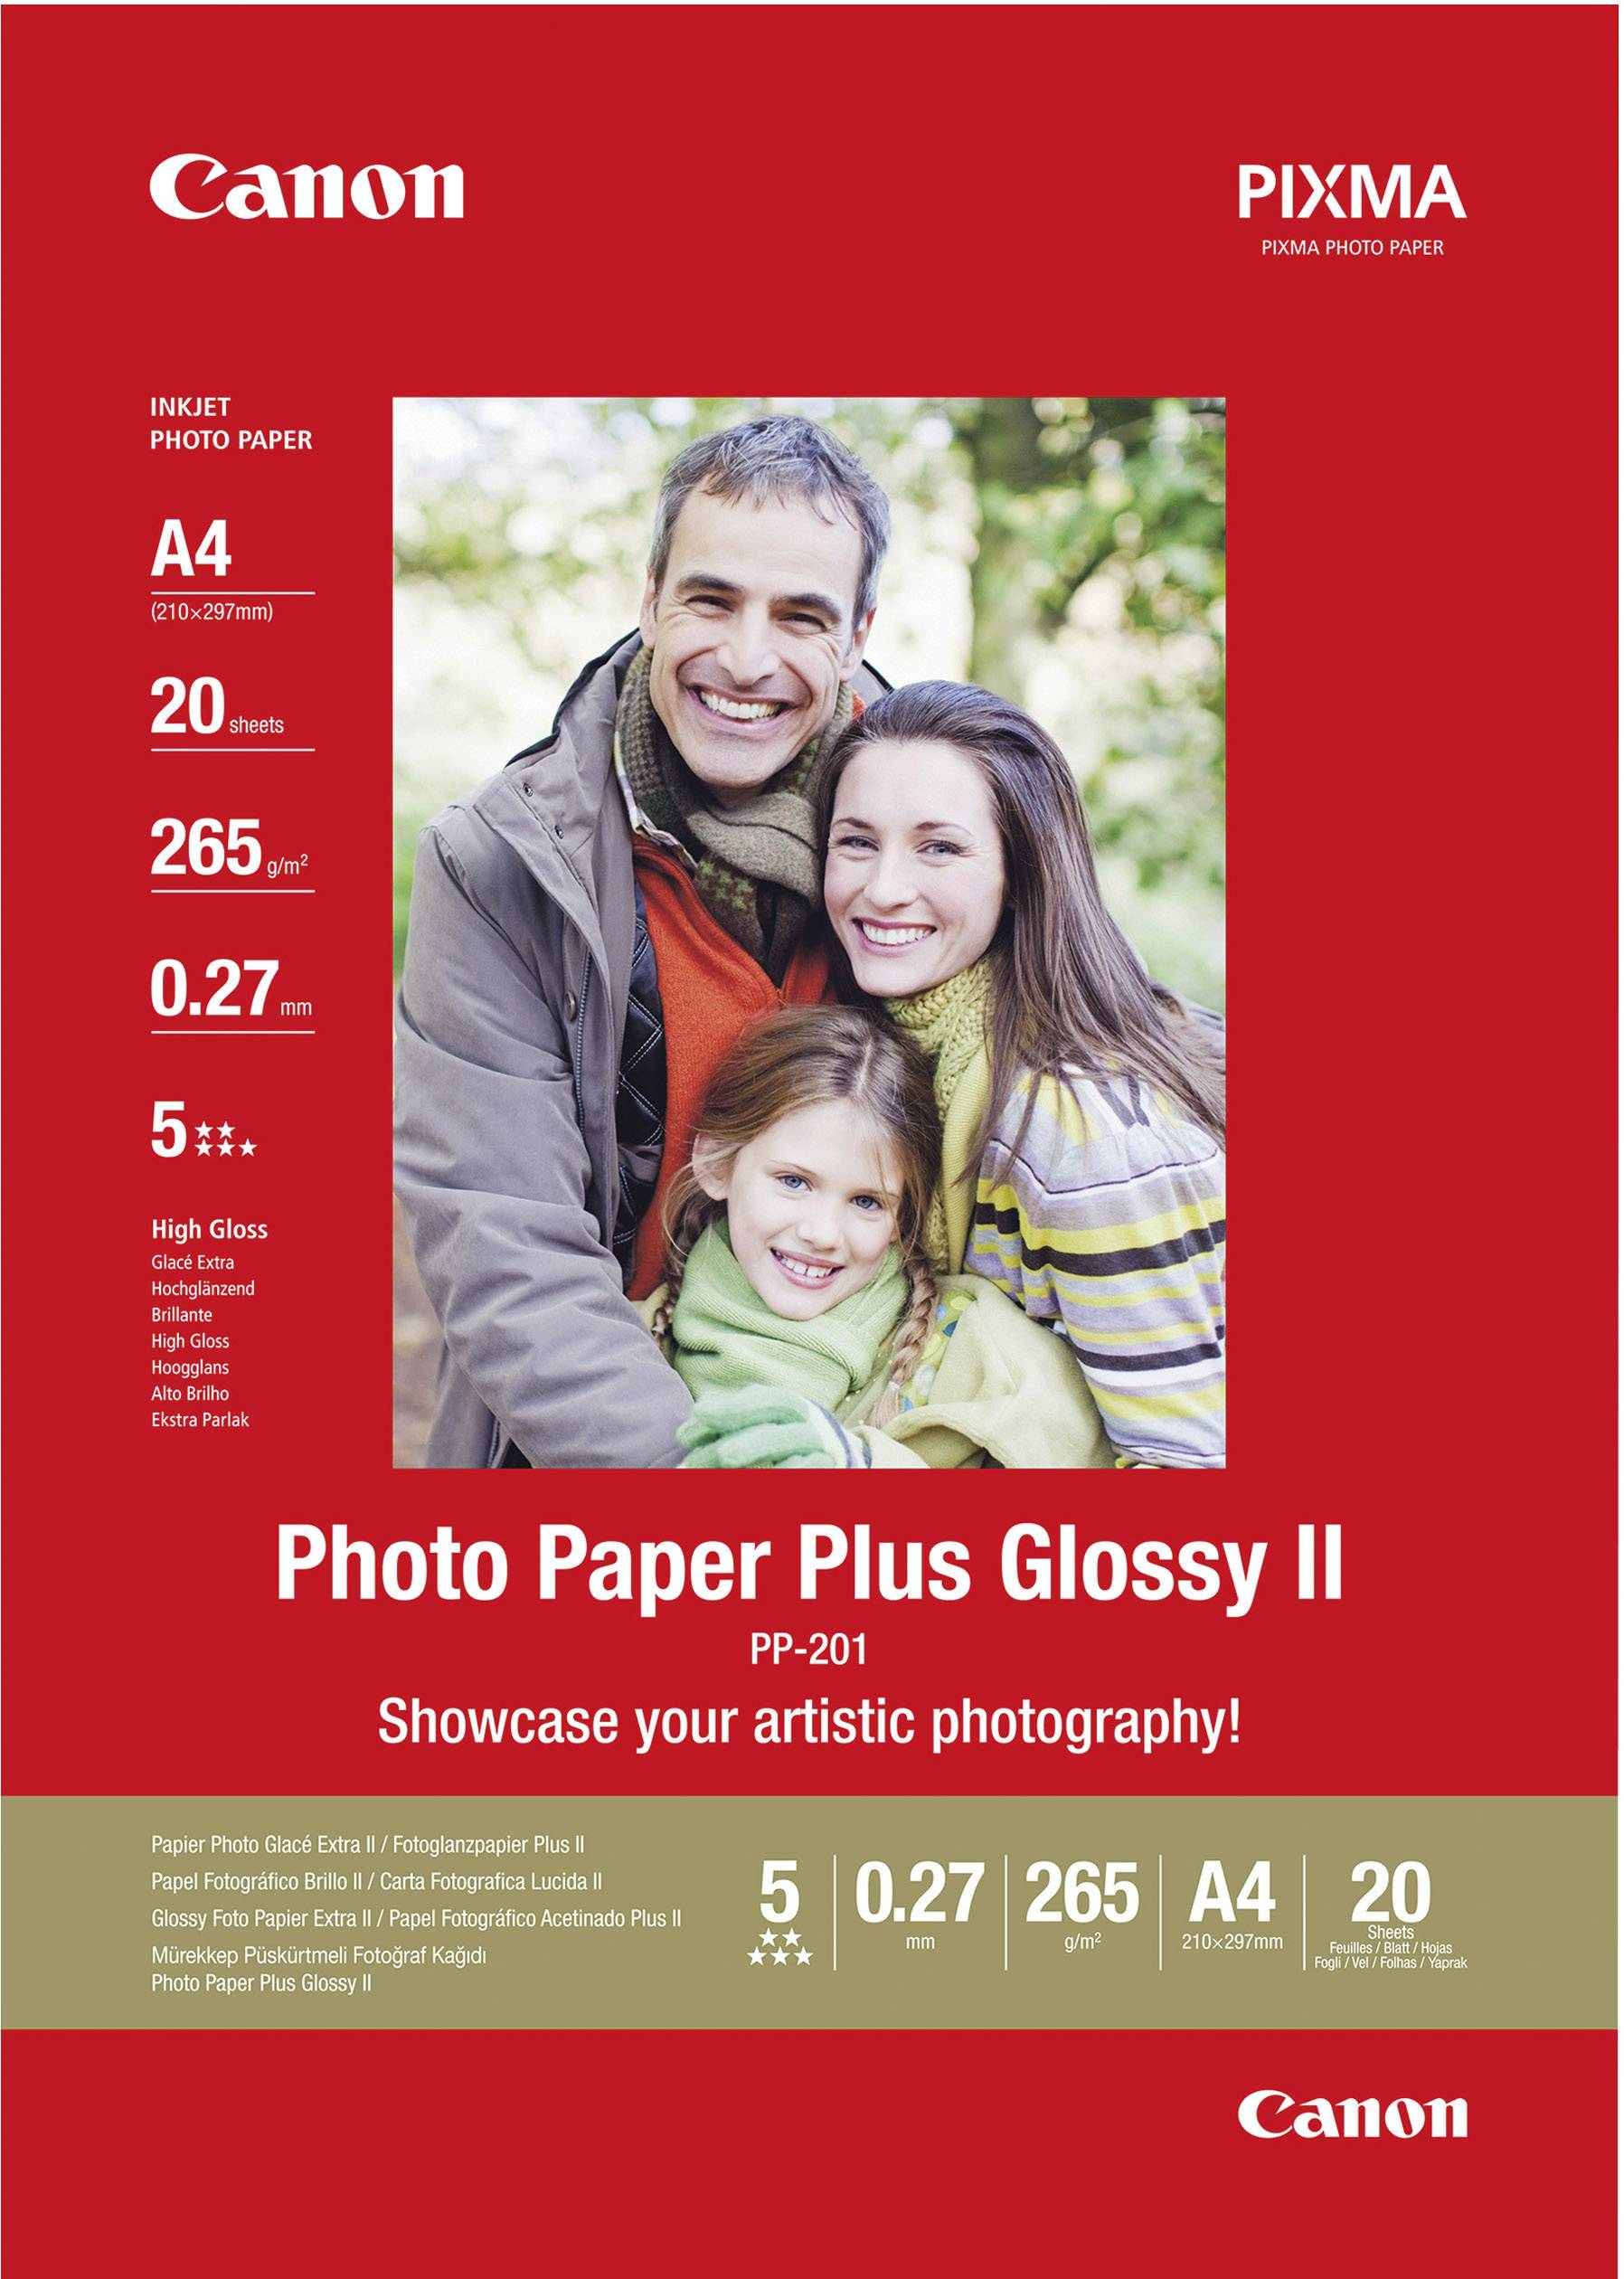 Fotografický papír Canon Photo Paper Plus Glossy II PP-201 2311B019, A4, 265 gm², 20 listů